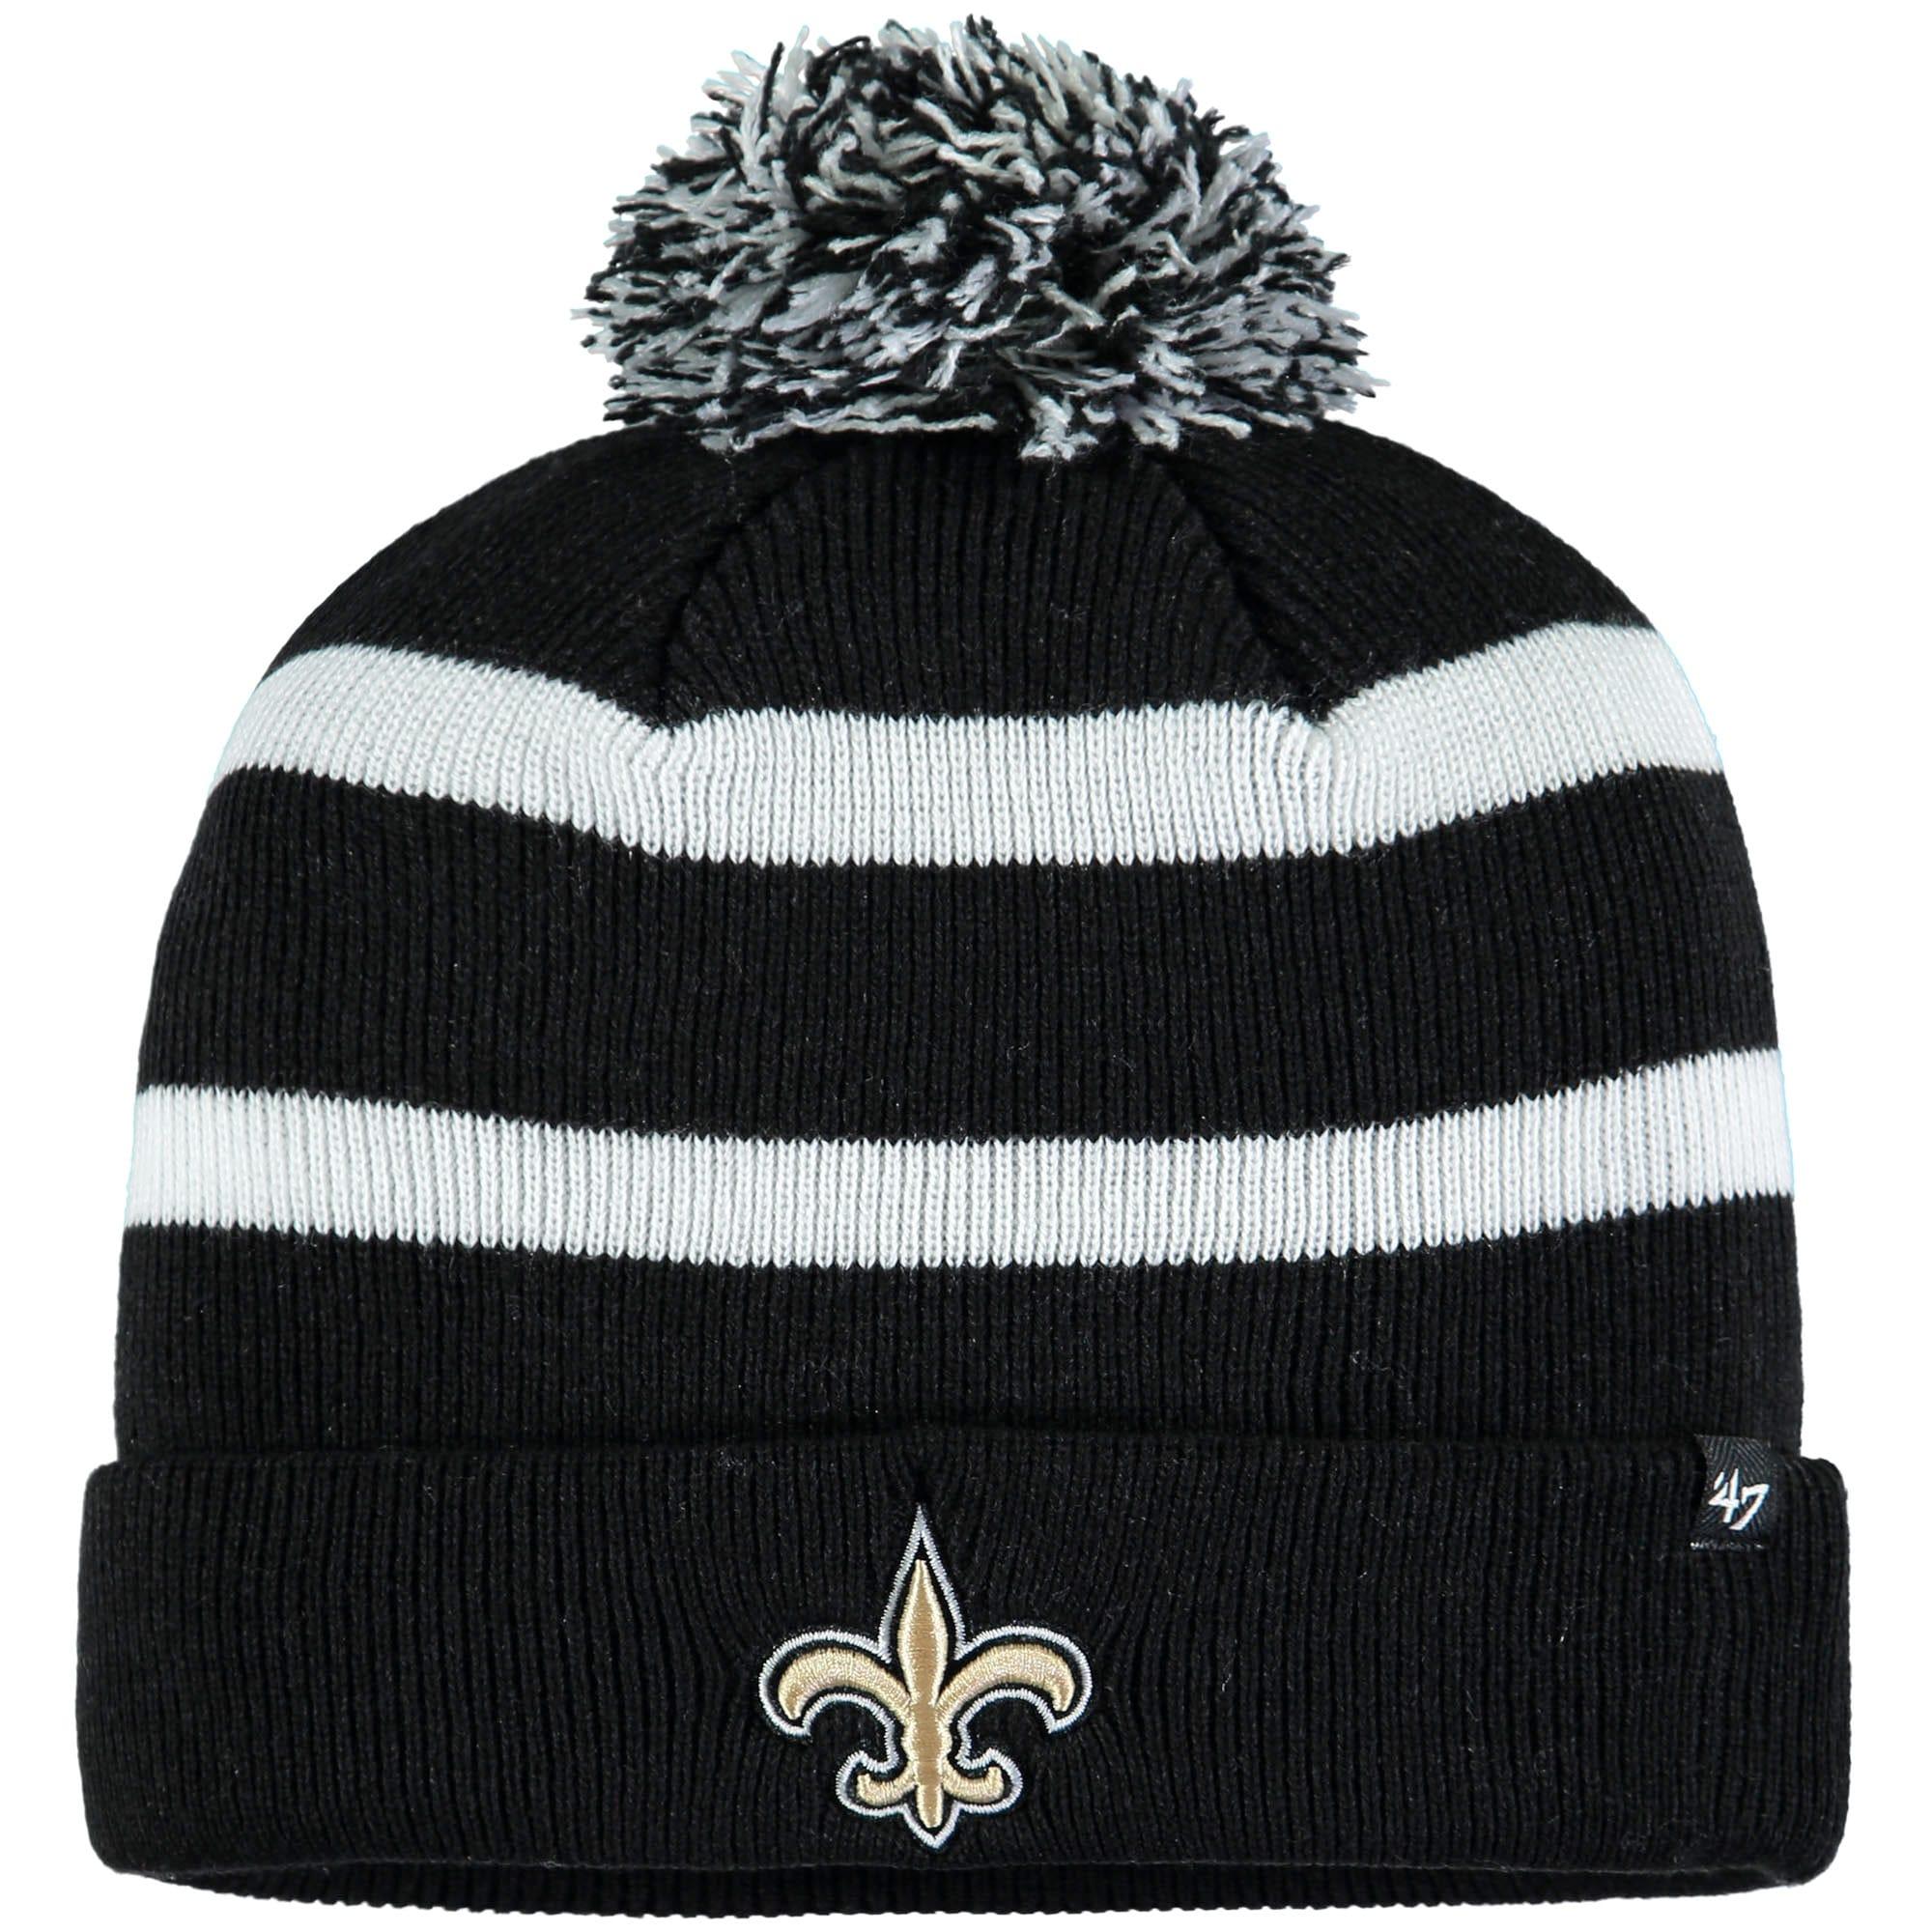 New Orleans Saints '47 Breakaway Cuffed Knit Hat with Pom - Black